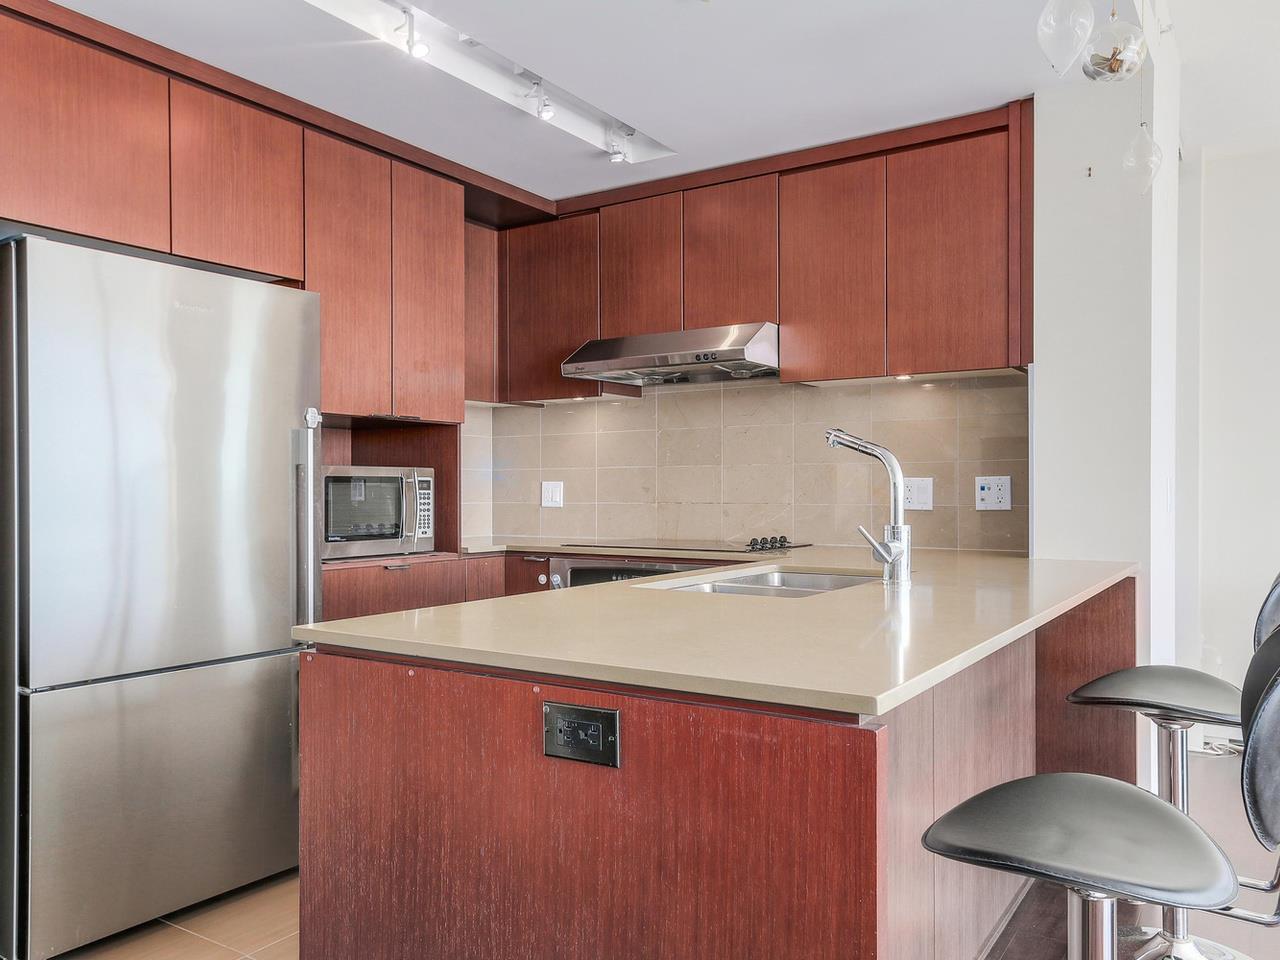 Condo Apartment at 1201 1320 CHESTERFIELD AVENUE, Unit 1201, North Vancouver, British Columbia. Image 11